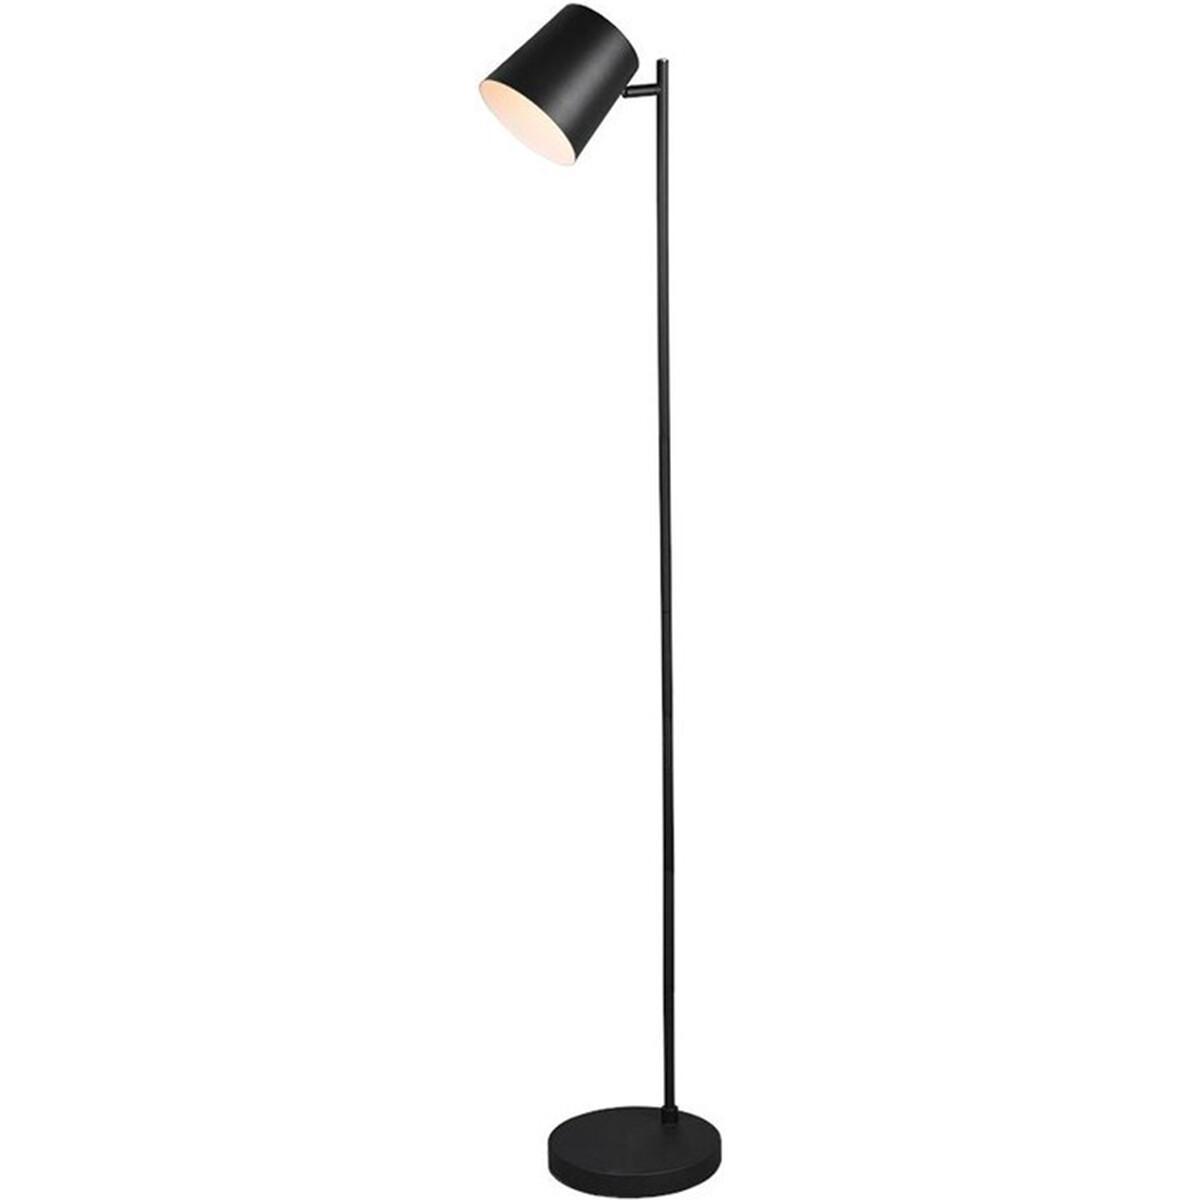 LED Vloerlamp - Trion Blade - 4W - Warm Wit 3000K - Dimbaar - Rond - Mat Zwart - Aluminium